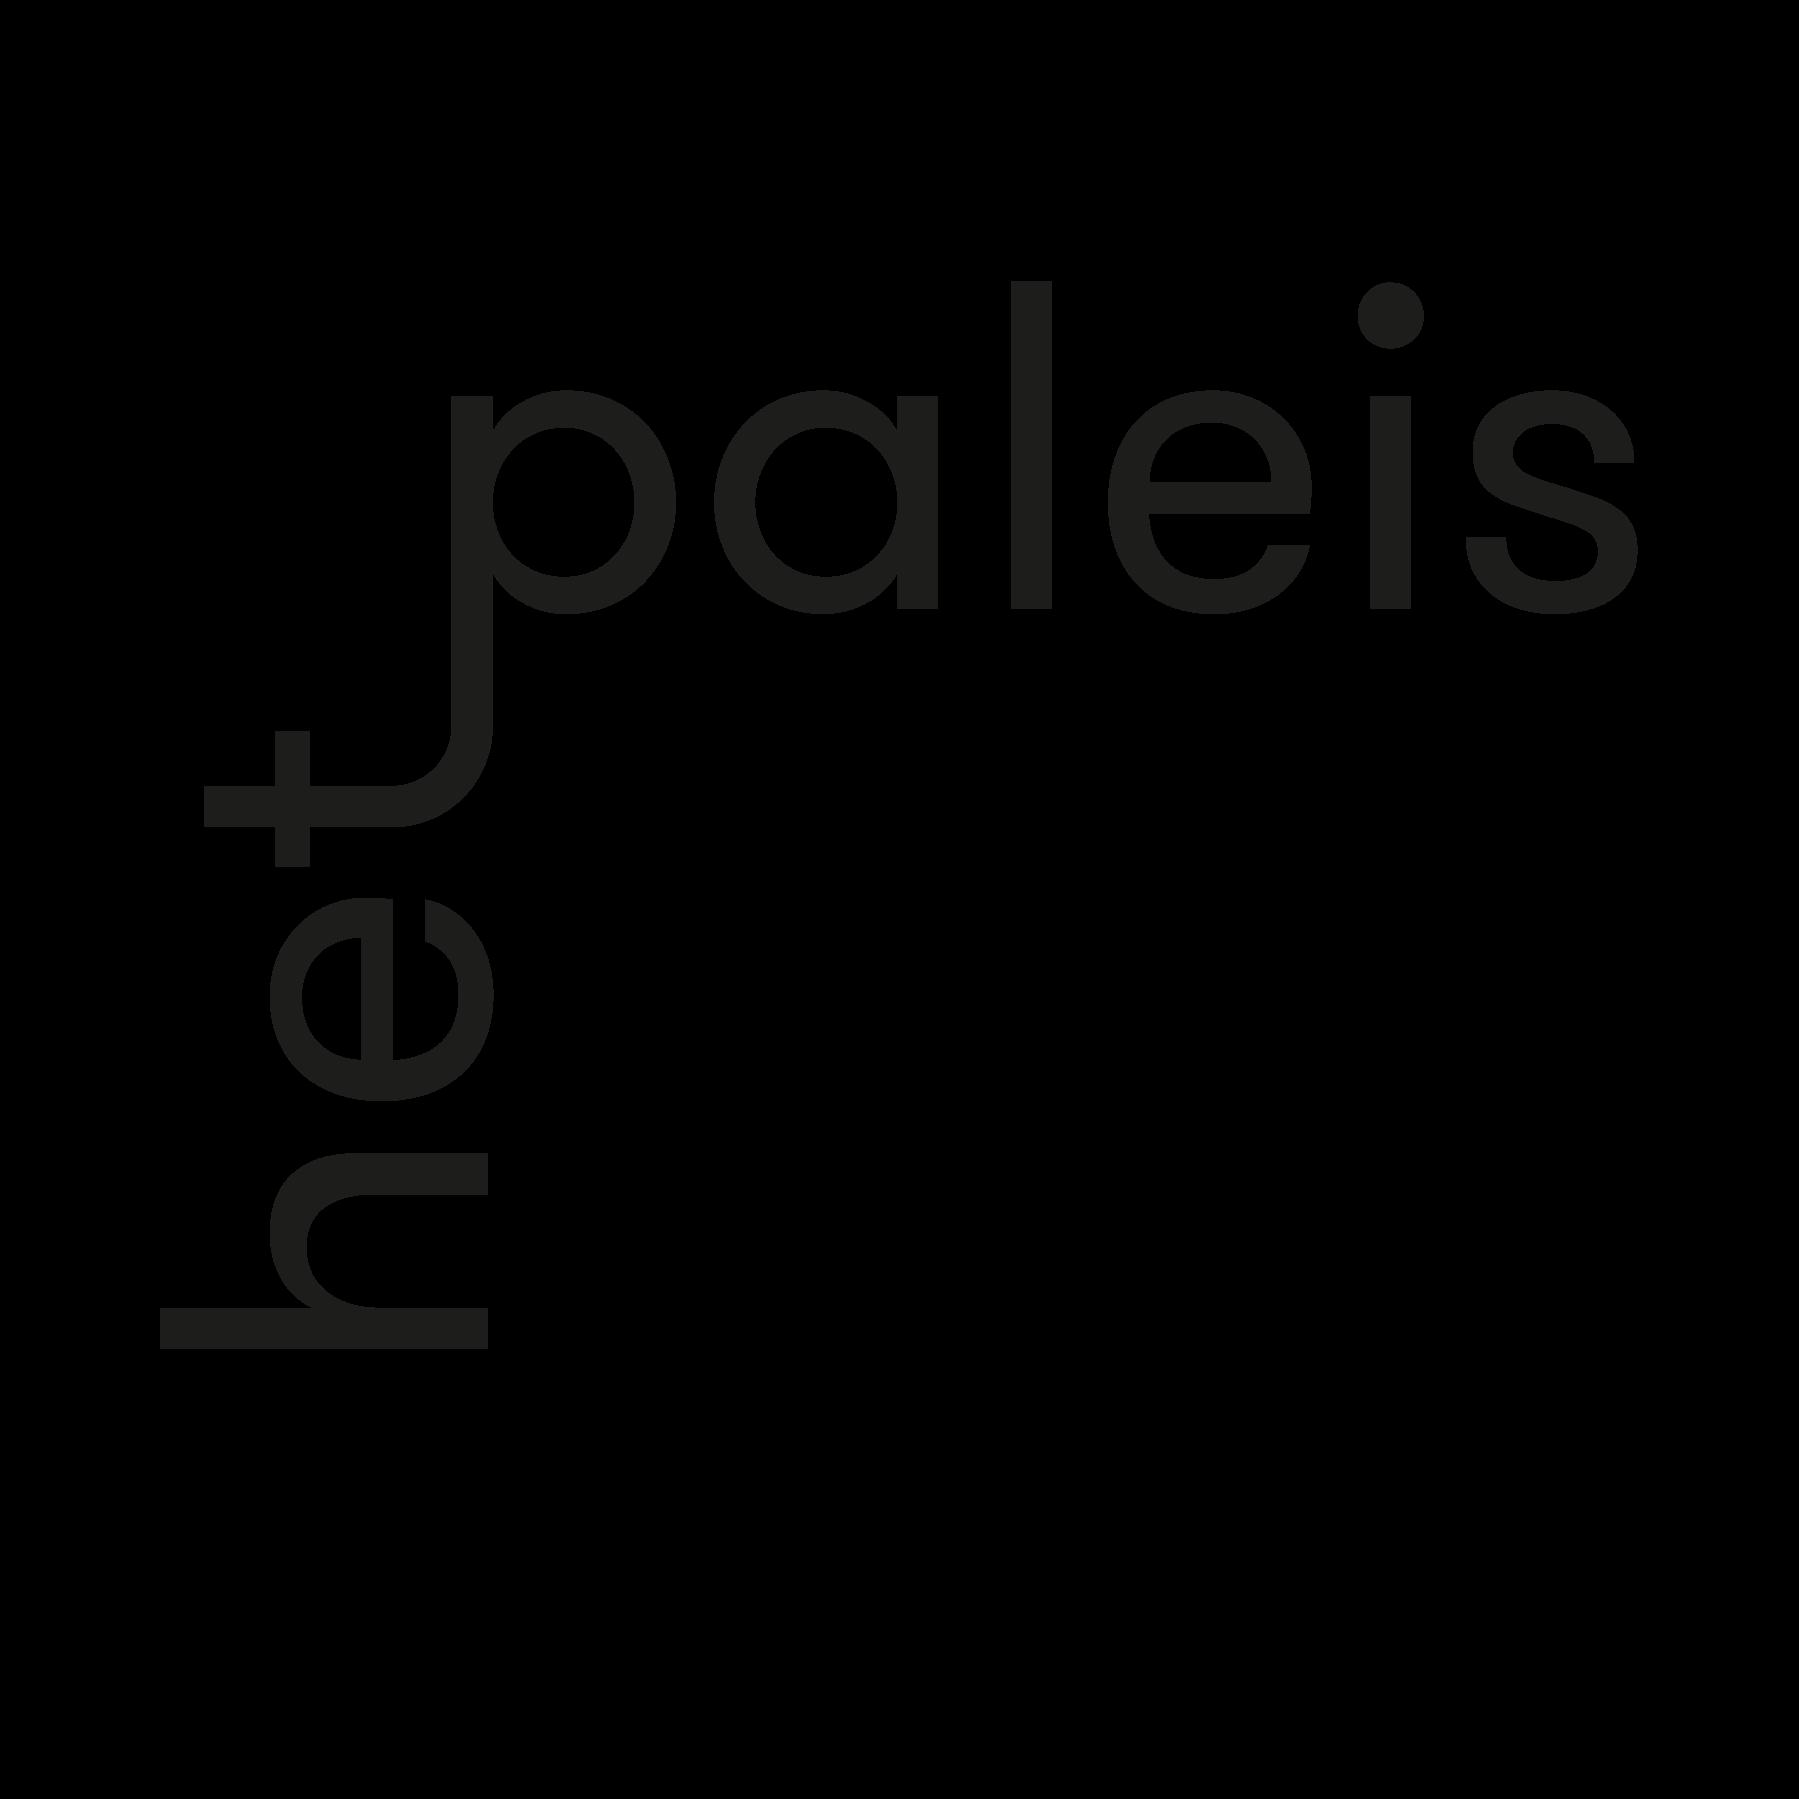 logo het paleis